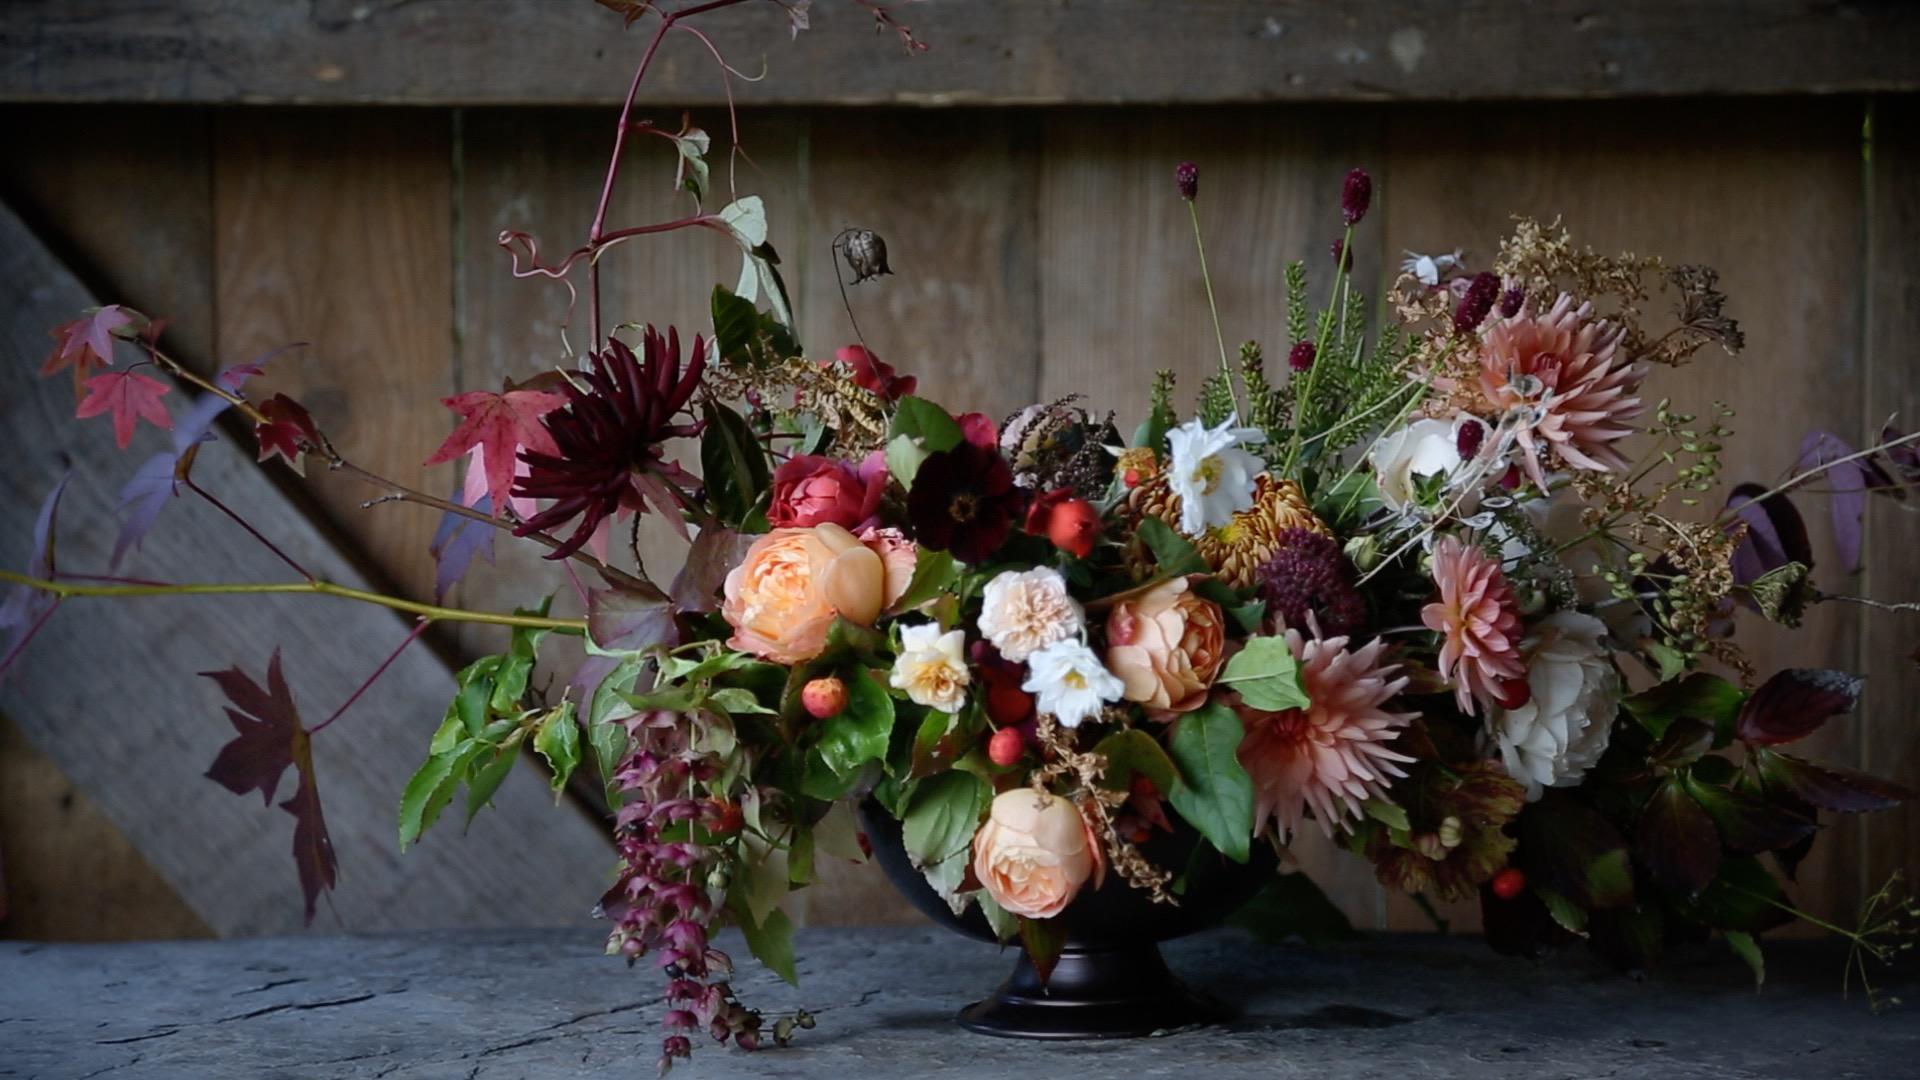 Nancarrow Farm Wedding Film Garden Gate Floweres